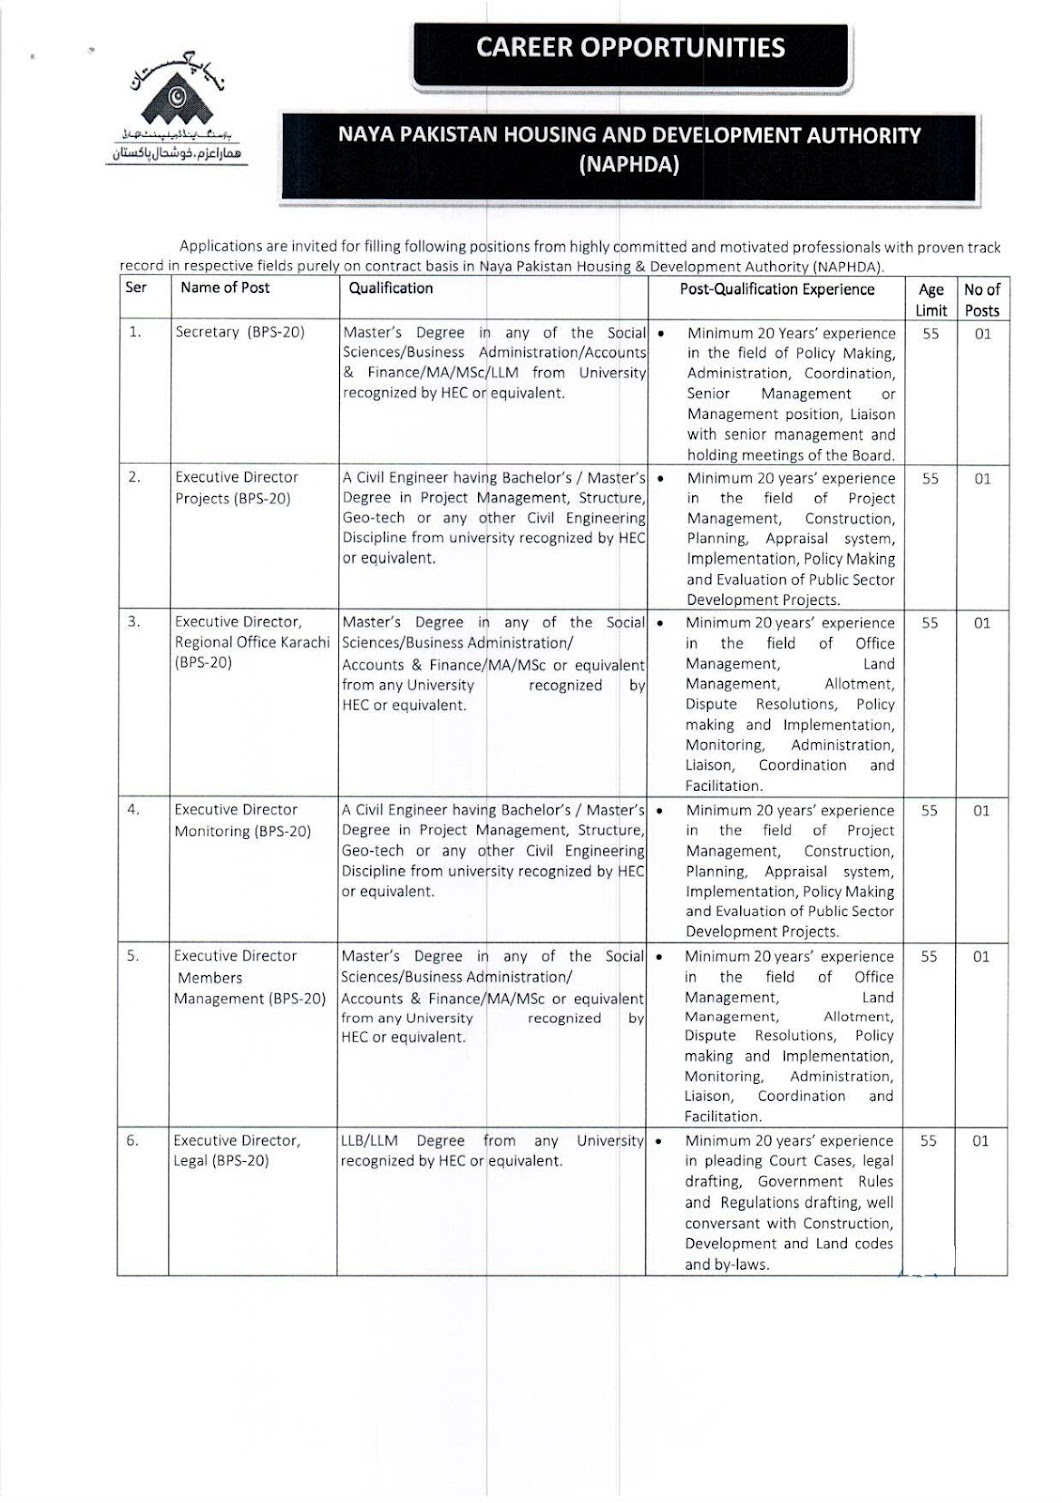 Naya Pakistan Housing Development Authority (NPHDA) Govt Jobs 2021